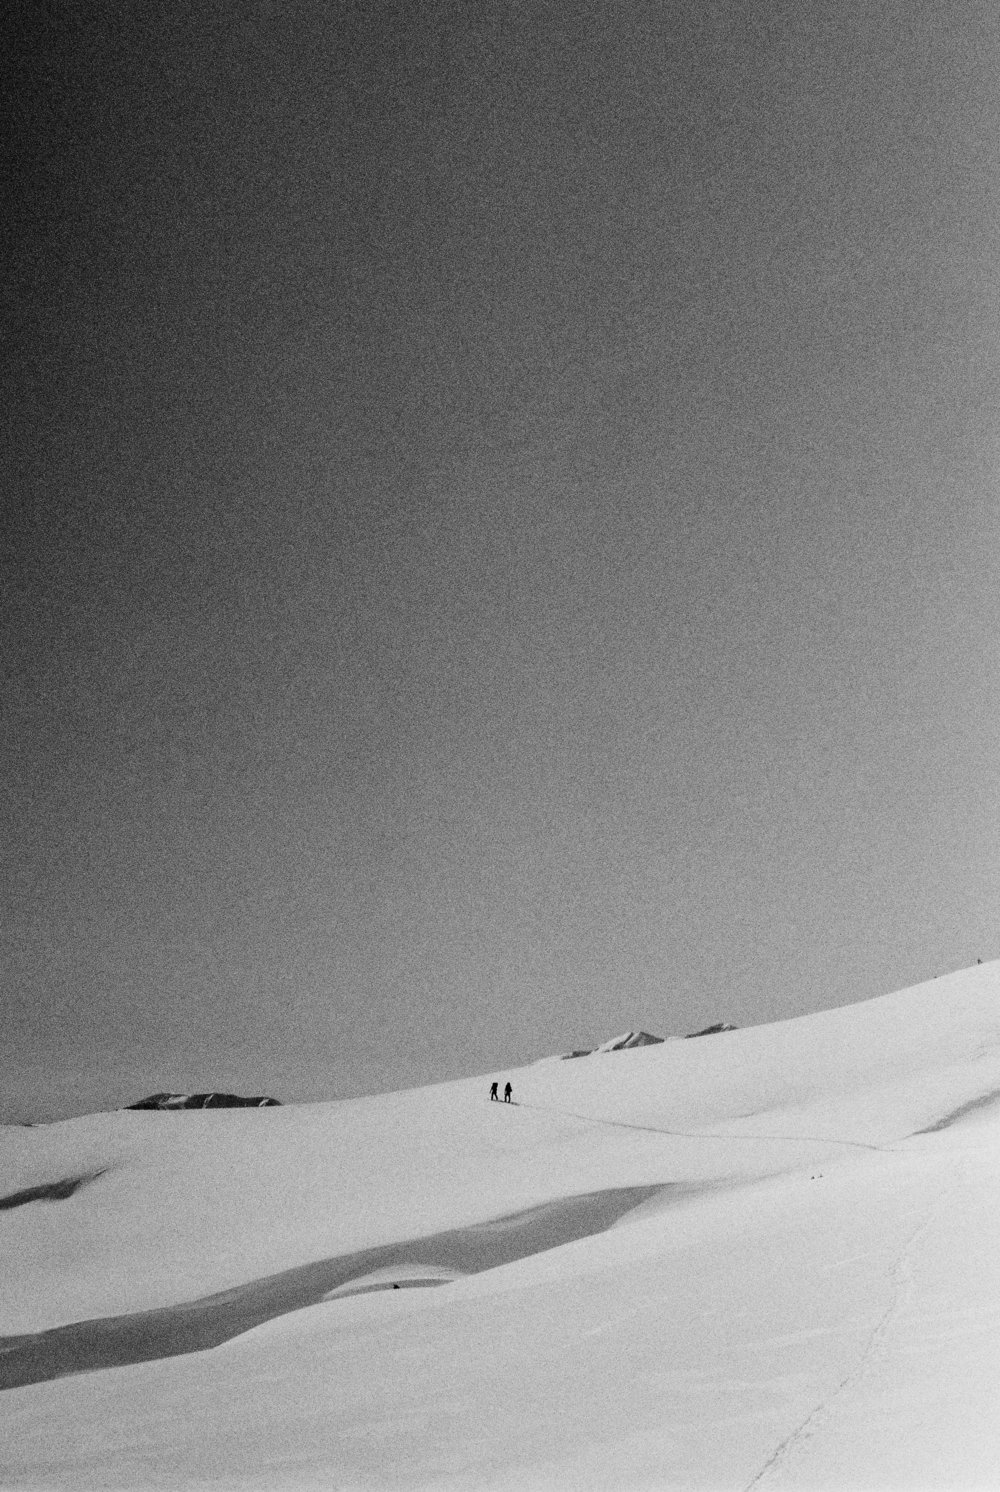 Carlos Blanchard, Albania 2015 - Canon Eos 1, Kodak T-MAX